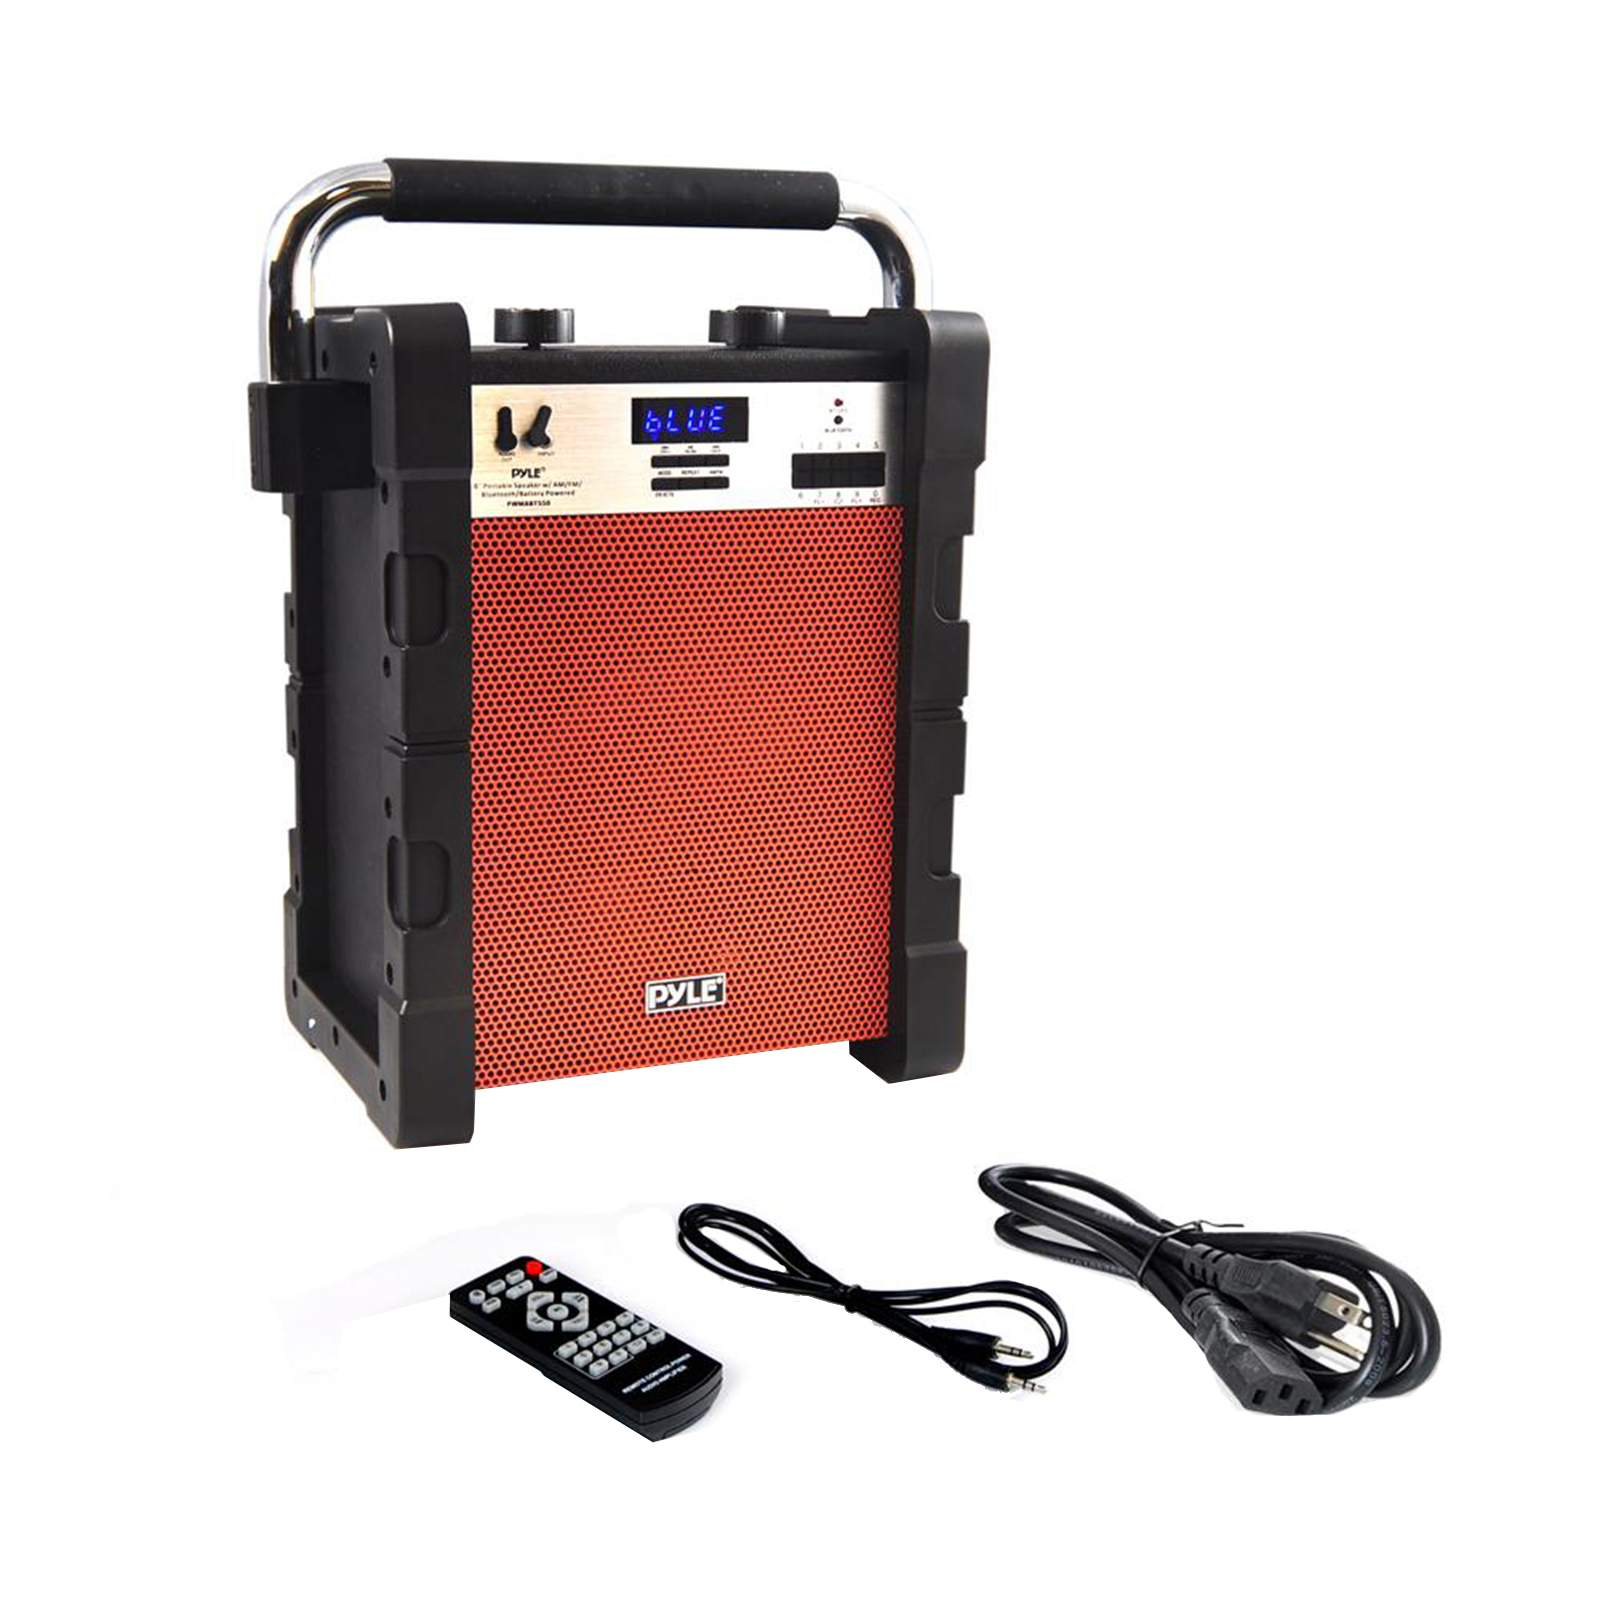 BT Rugged & Portable Speaker System, Work / Job Site Stereo, Built-in Battery, MP3/USB/SD, AM/FM Radio (Orange)